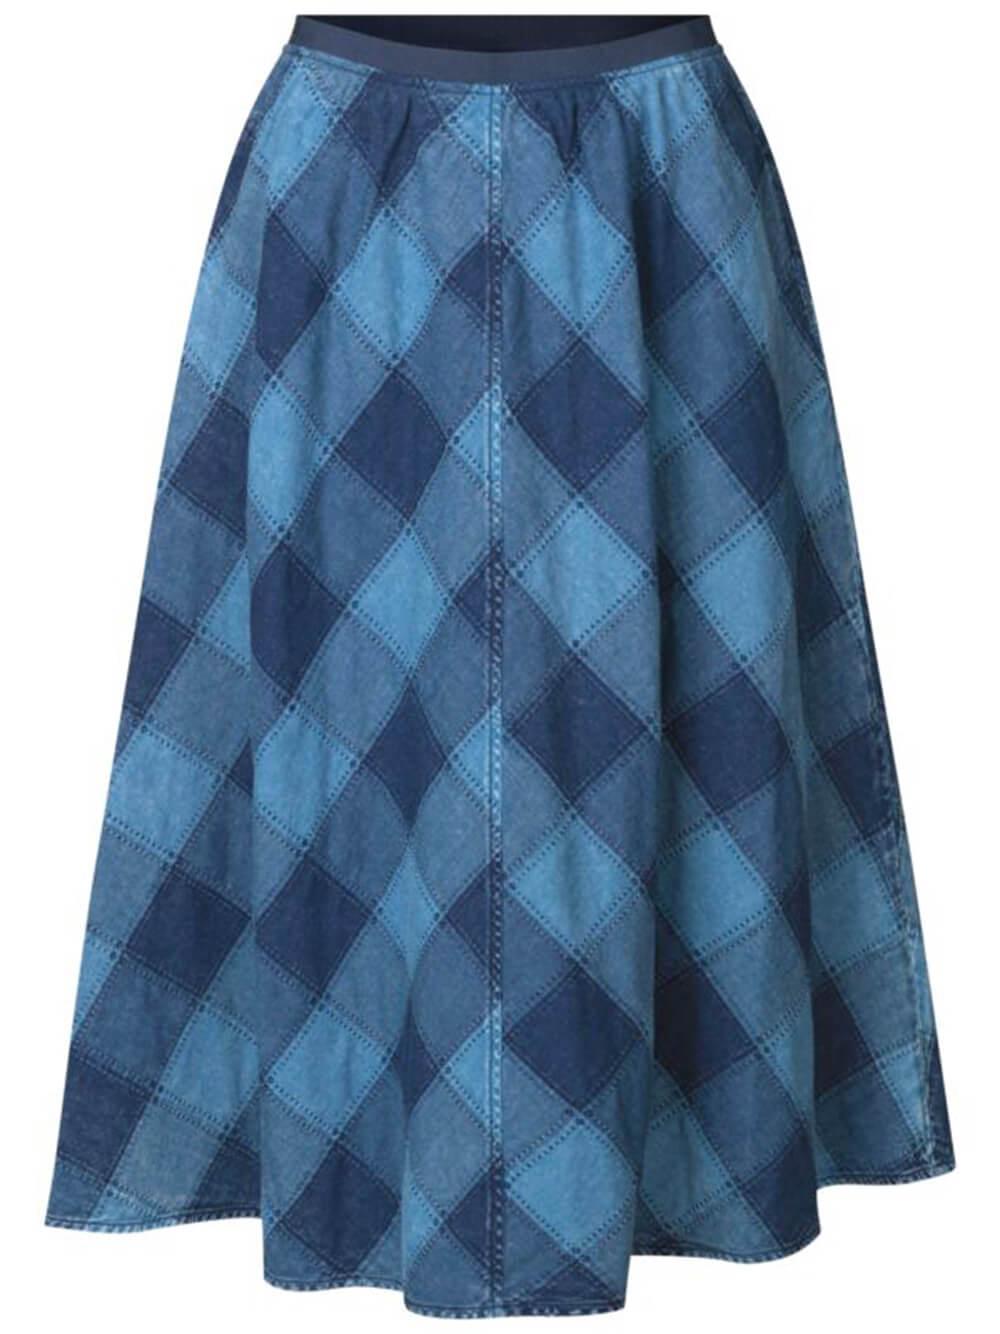 Shrella Skirt Item # 21781